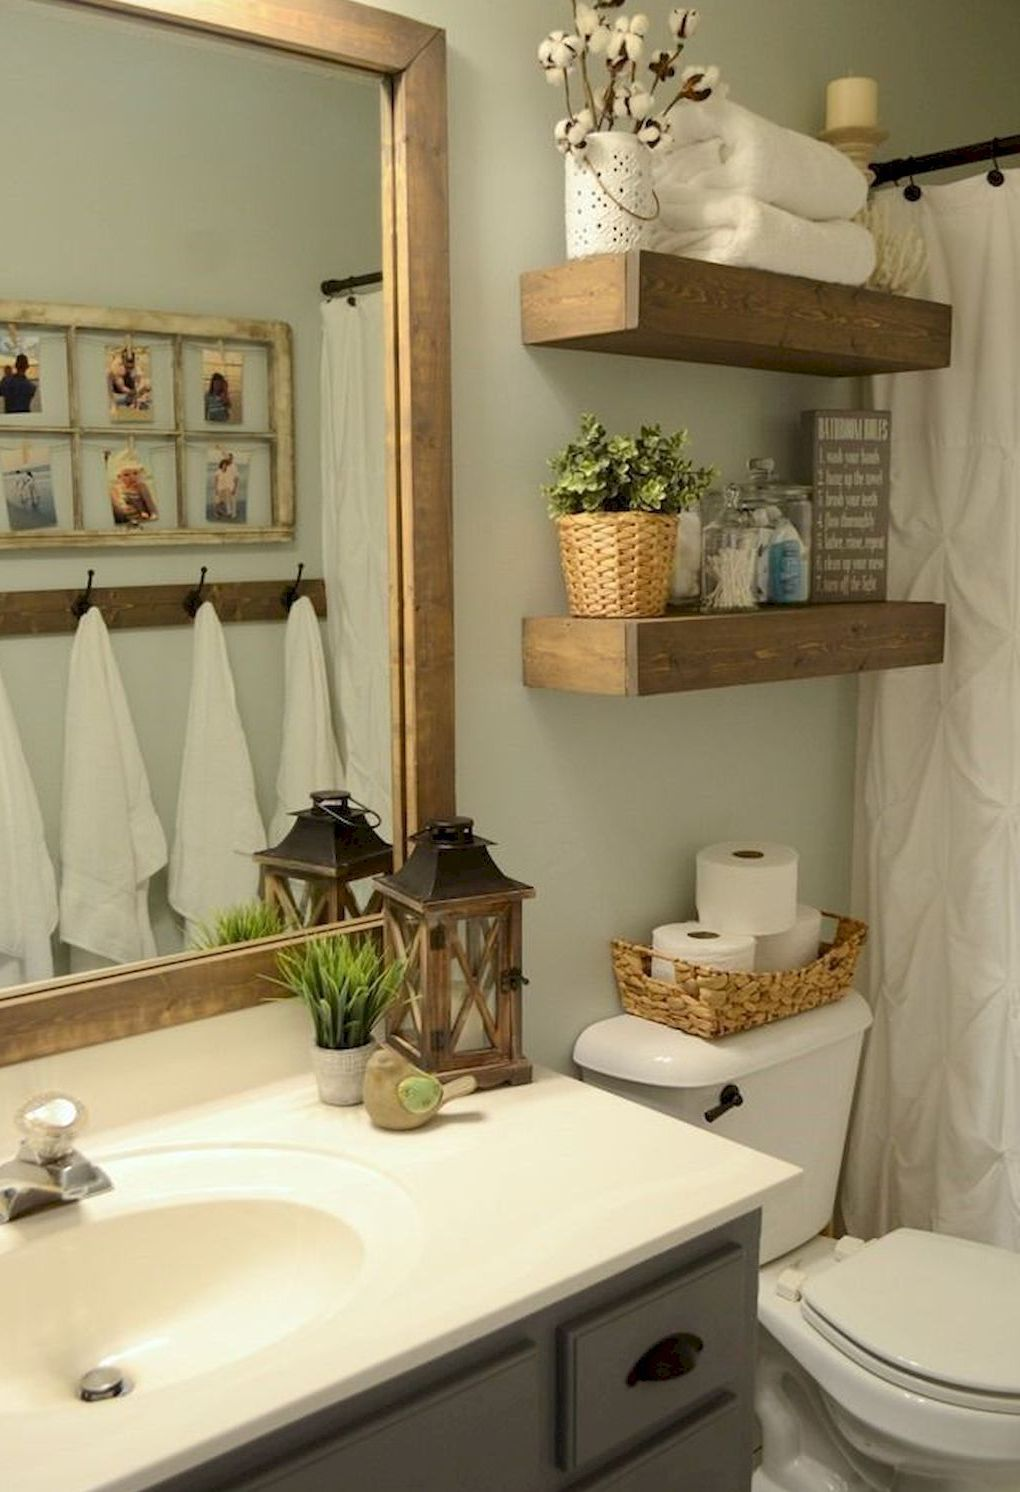 Nice 60 Rustic Farmhouse Small Bathroom Remodel And Decor Ideas #bathroom #farmhouse #ideas #